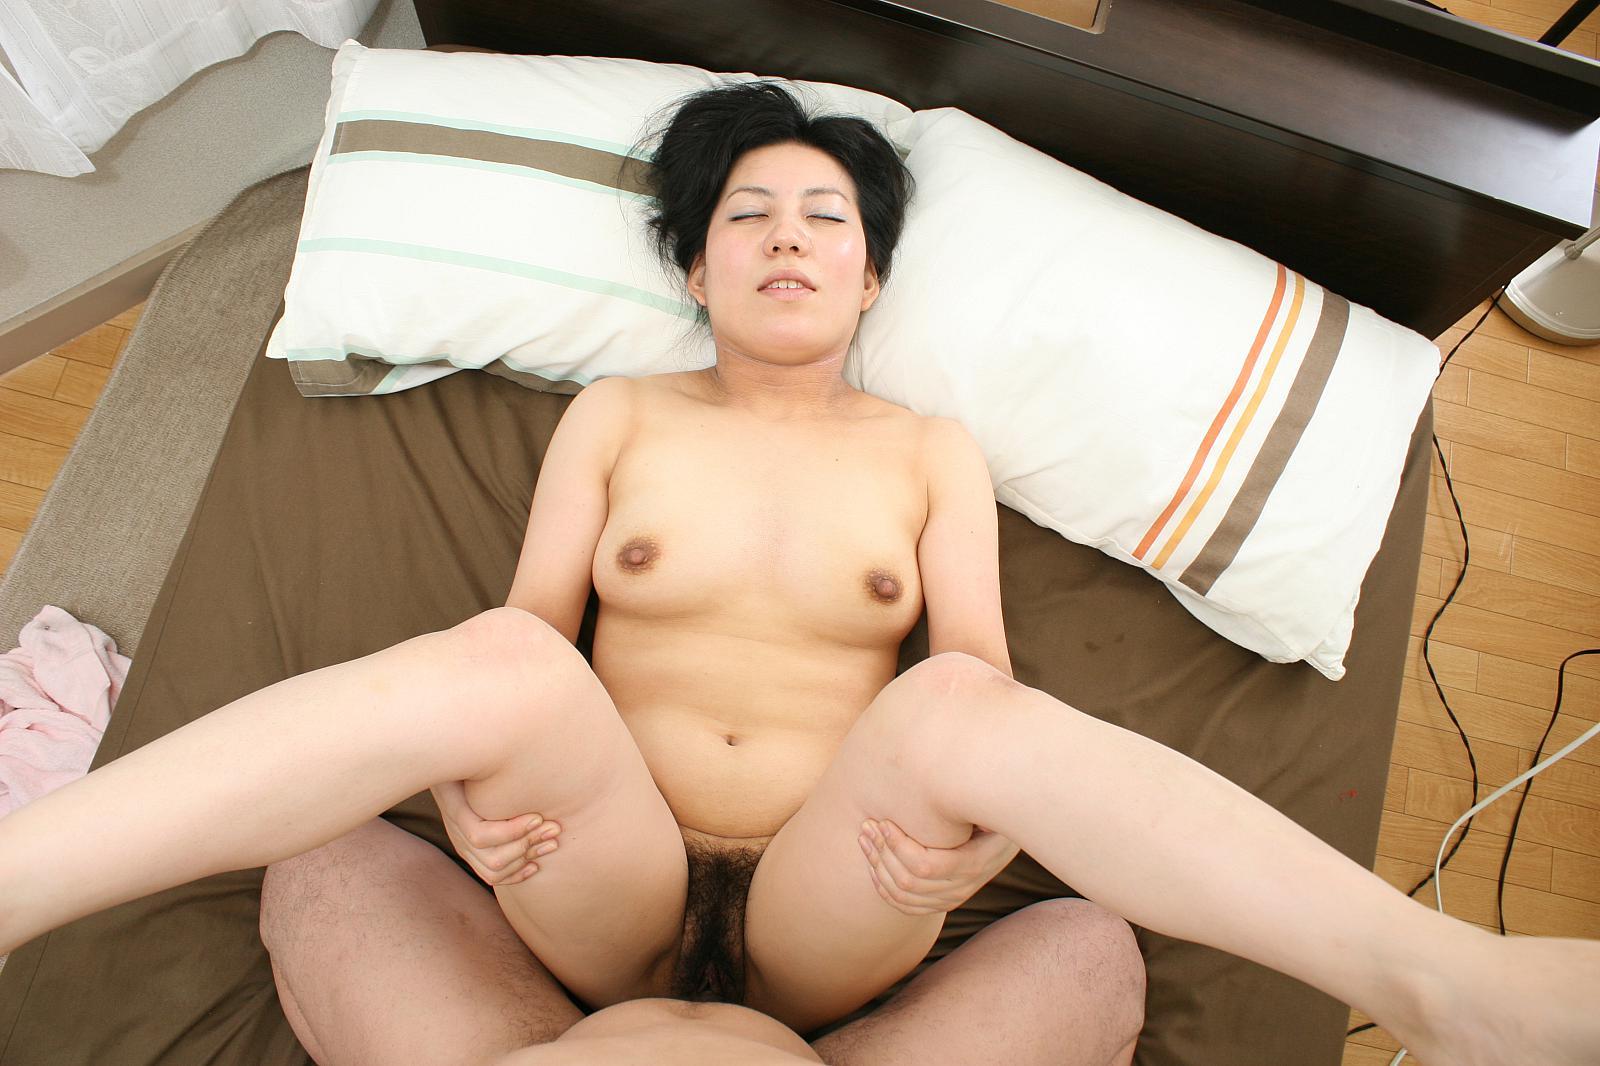 Korean Mature Slut Superwomen, Free Mature Slut Galery Porn Photo